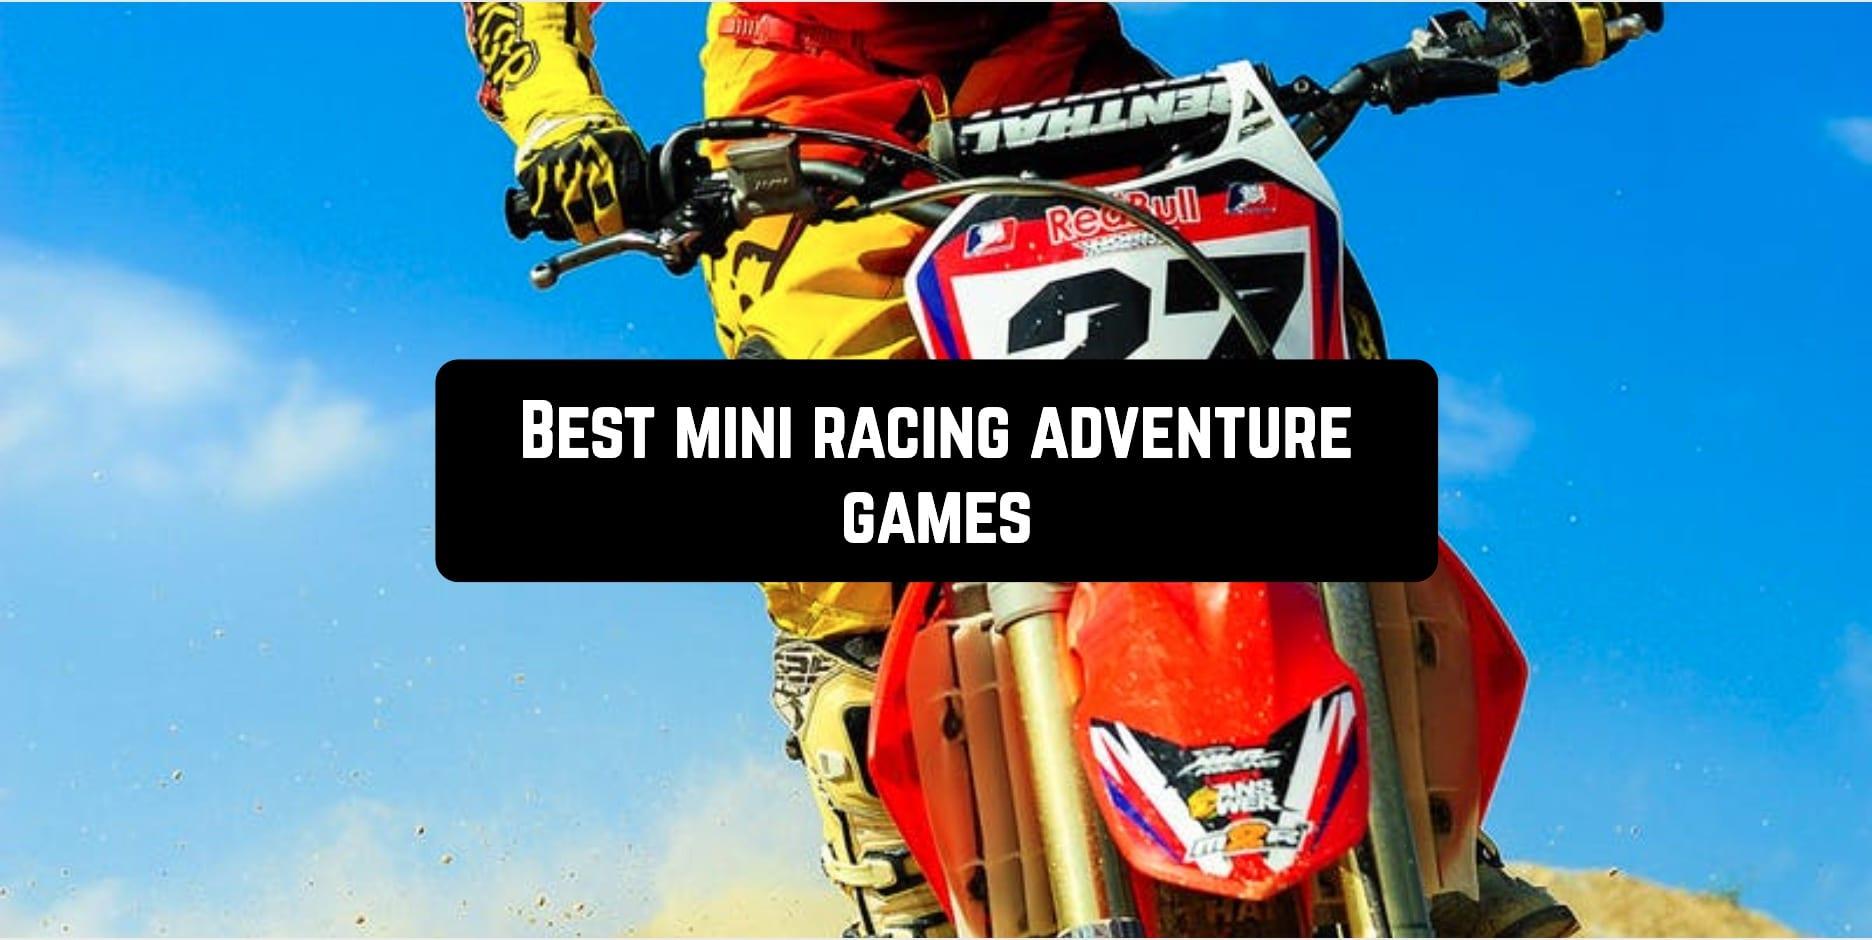 Best mini racing adventure games